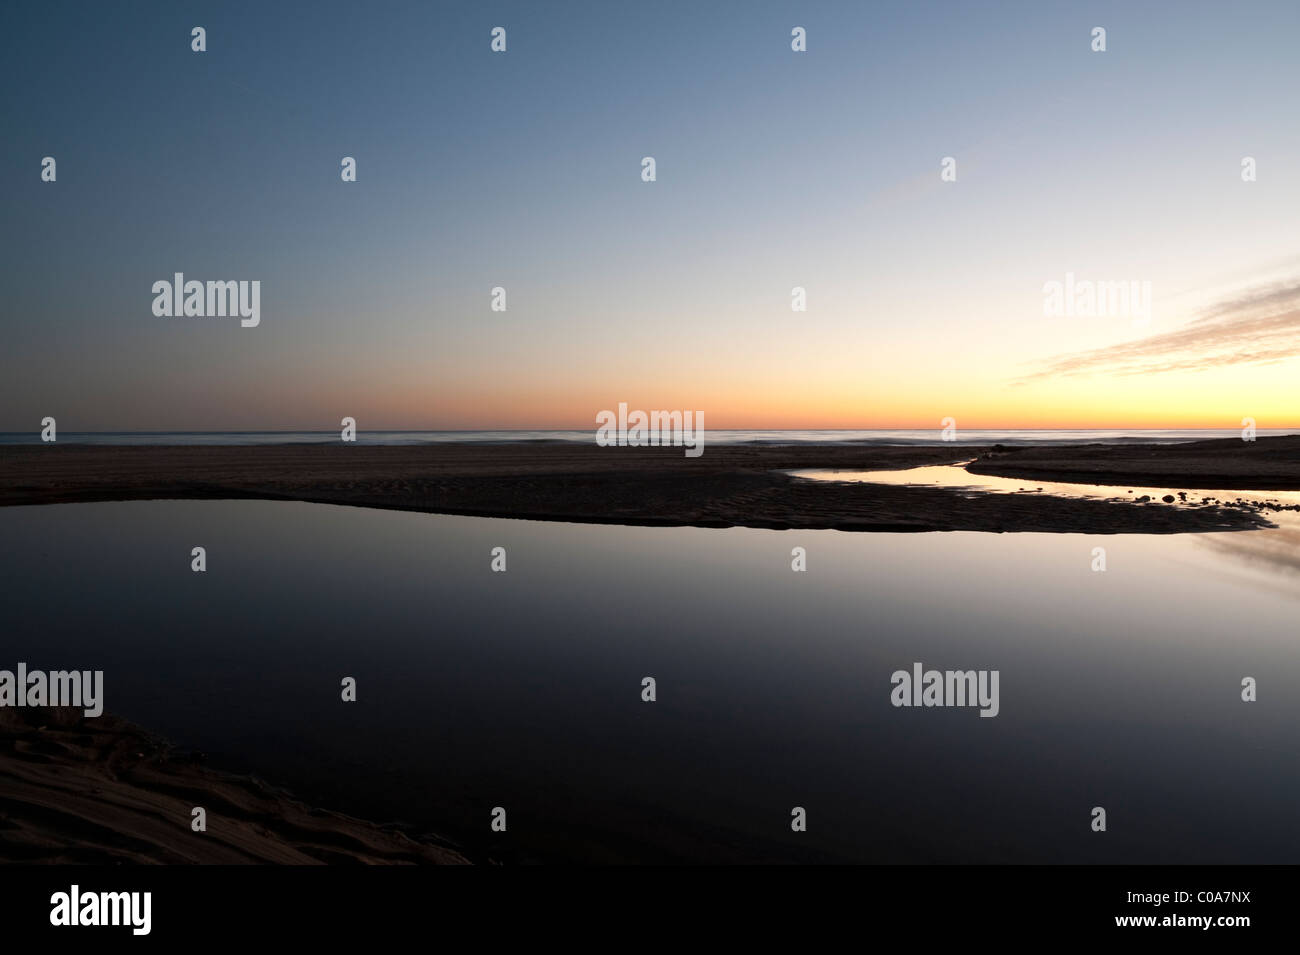 Sunset, sea and sky, Blue hour, Calm, Harmony, Meditation, Peace, Horizont - Stock Image